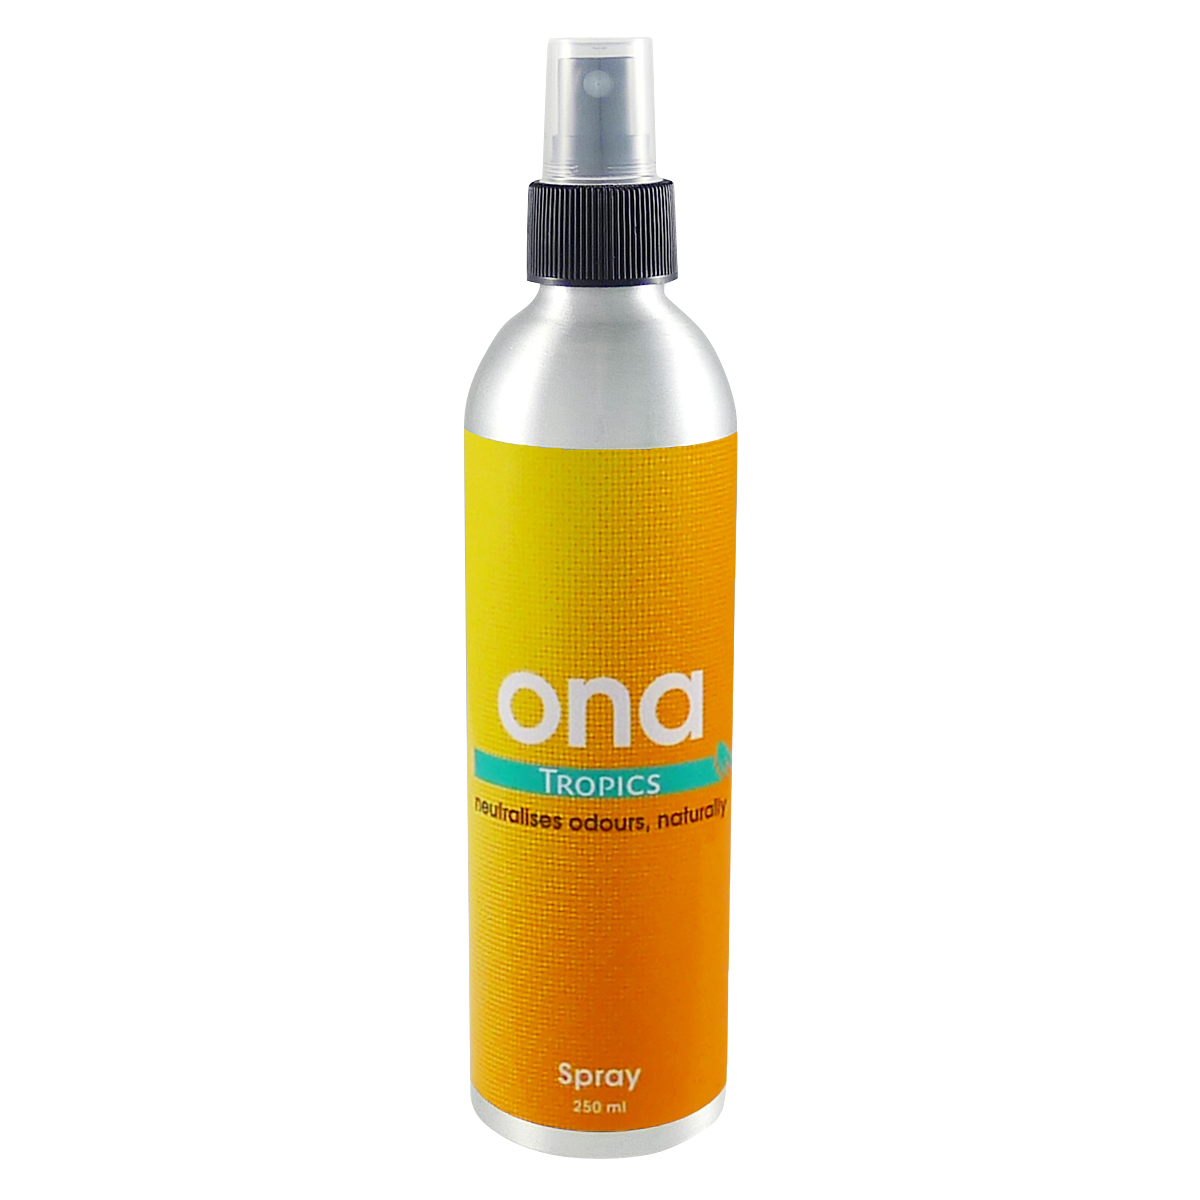 ONA Spray - osvěžovač vzduchu 250ml Fresh Linen